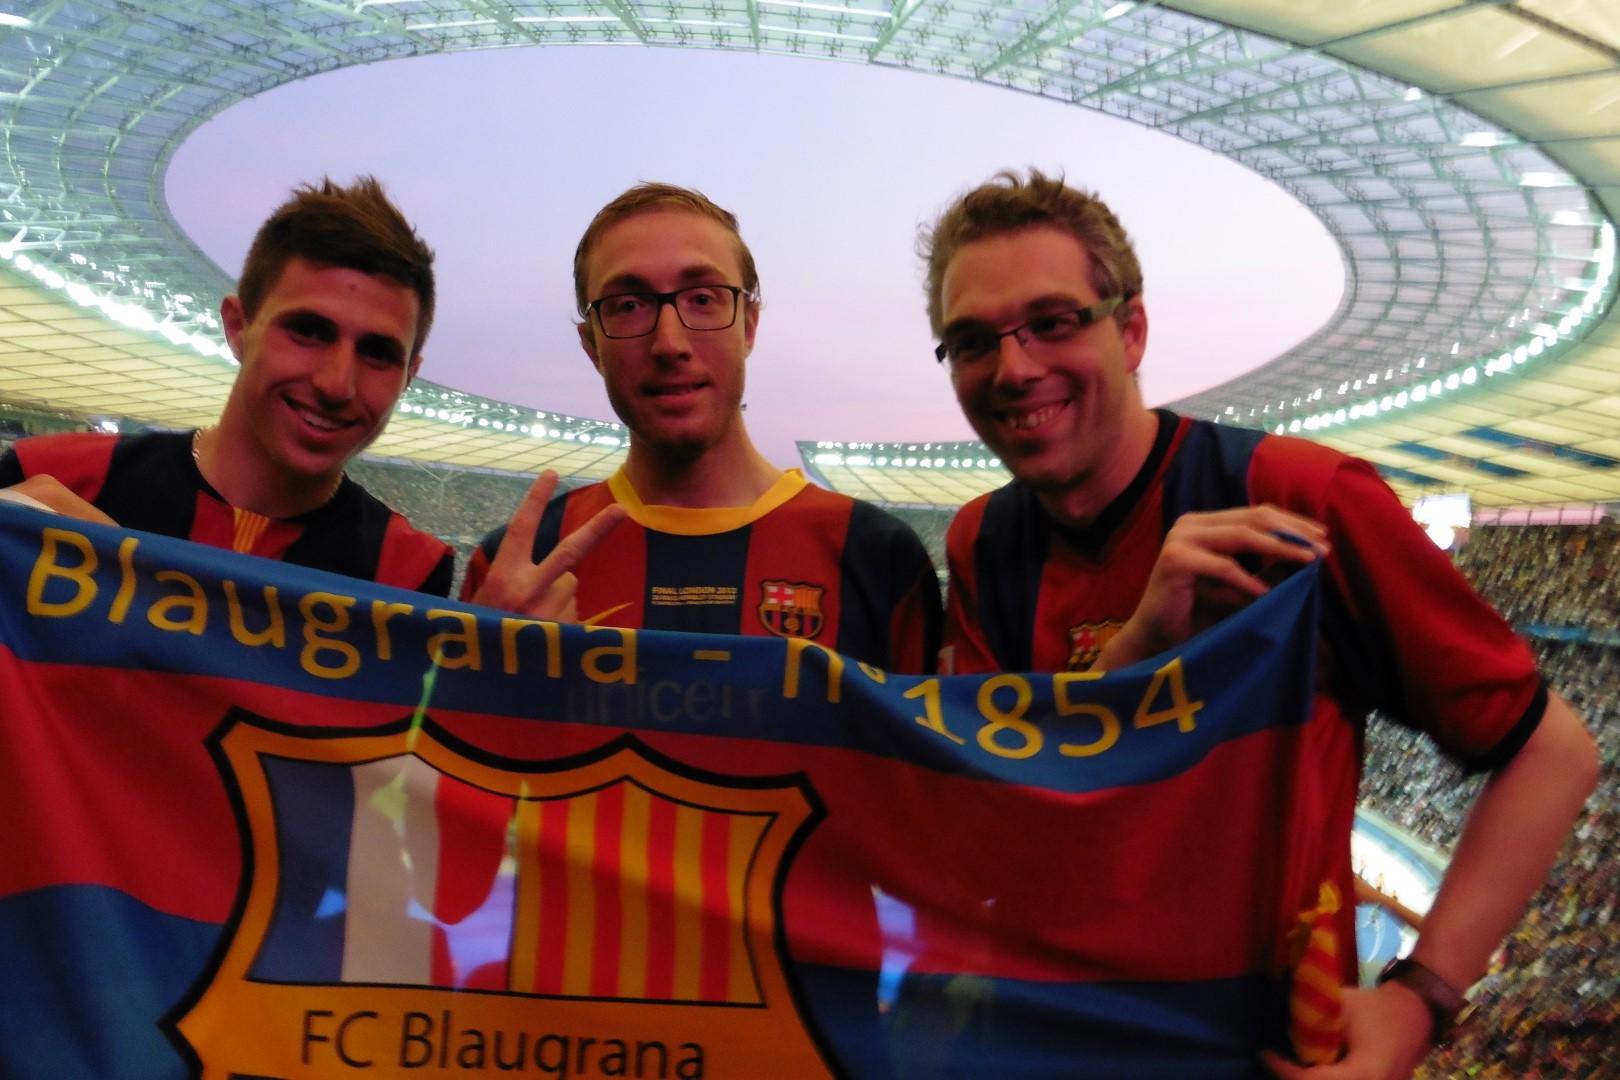 Finale Champions League Juventus Turin - FC Barcelona 1-3